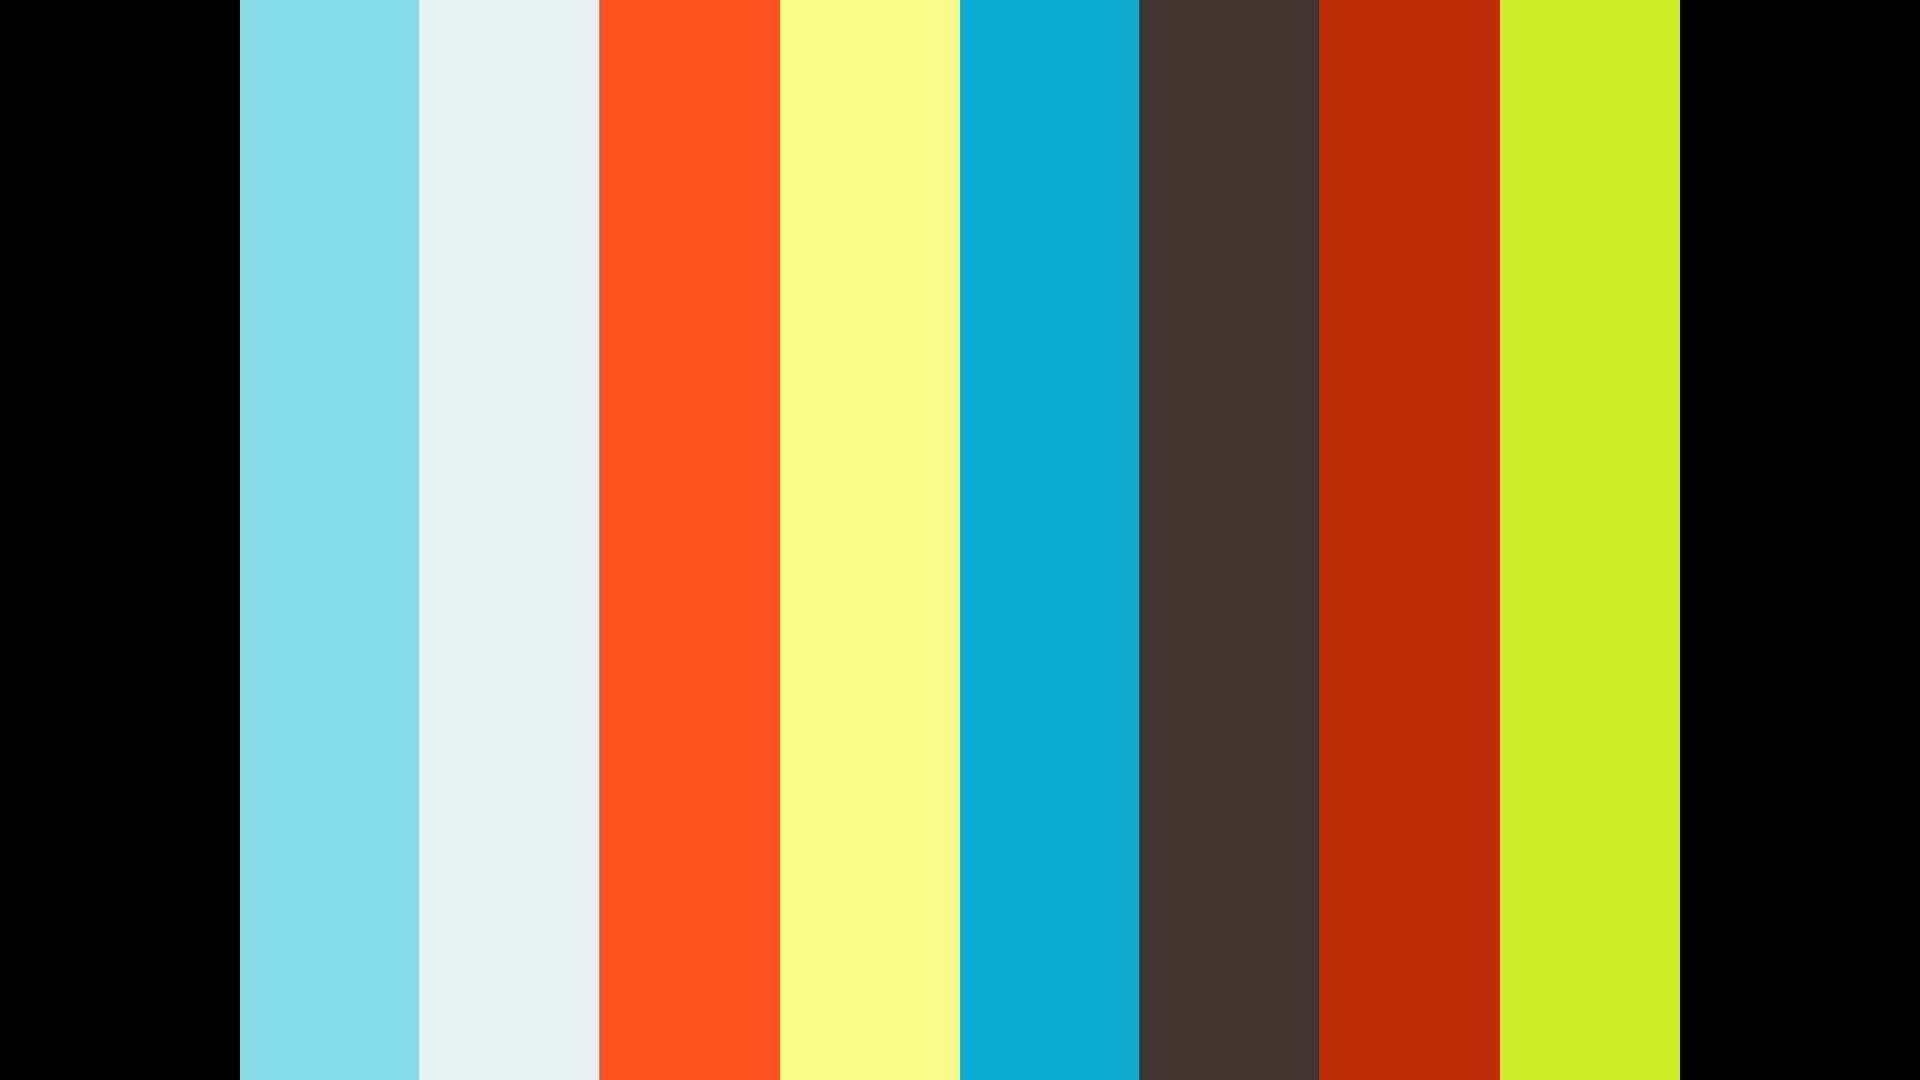 craig tubiolo – Episode 28_WIF_Mangano_CommFree.mp4